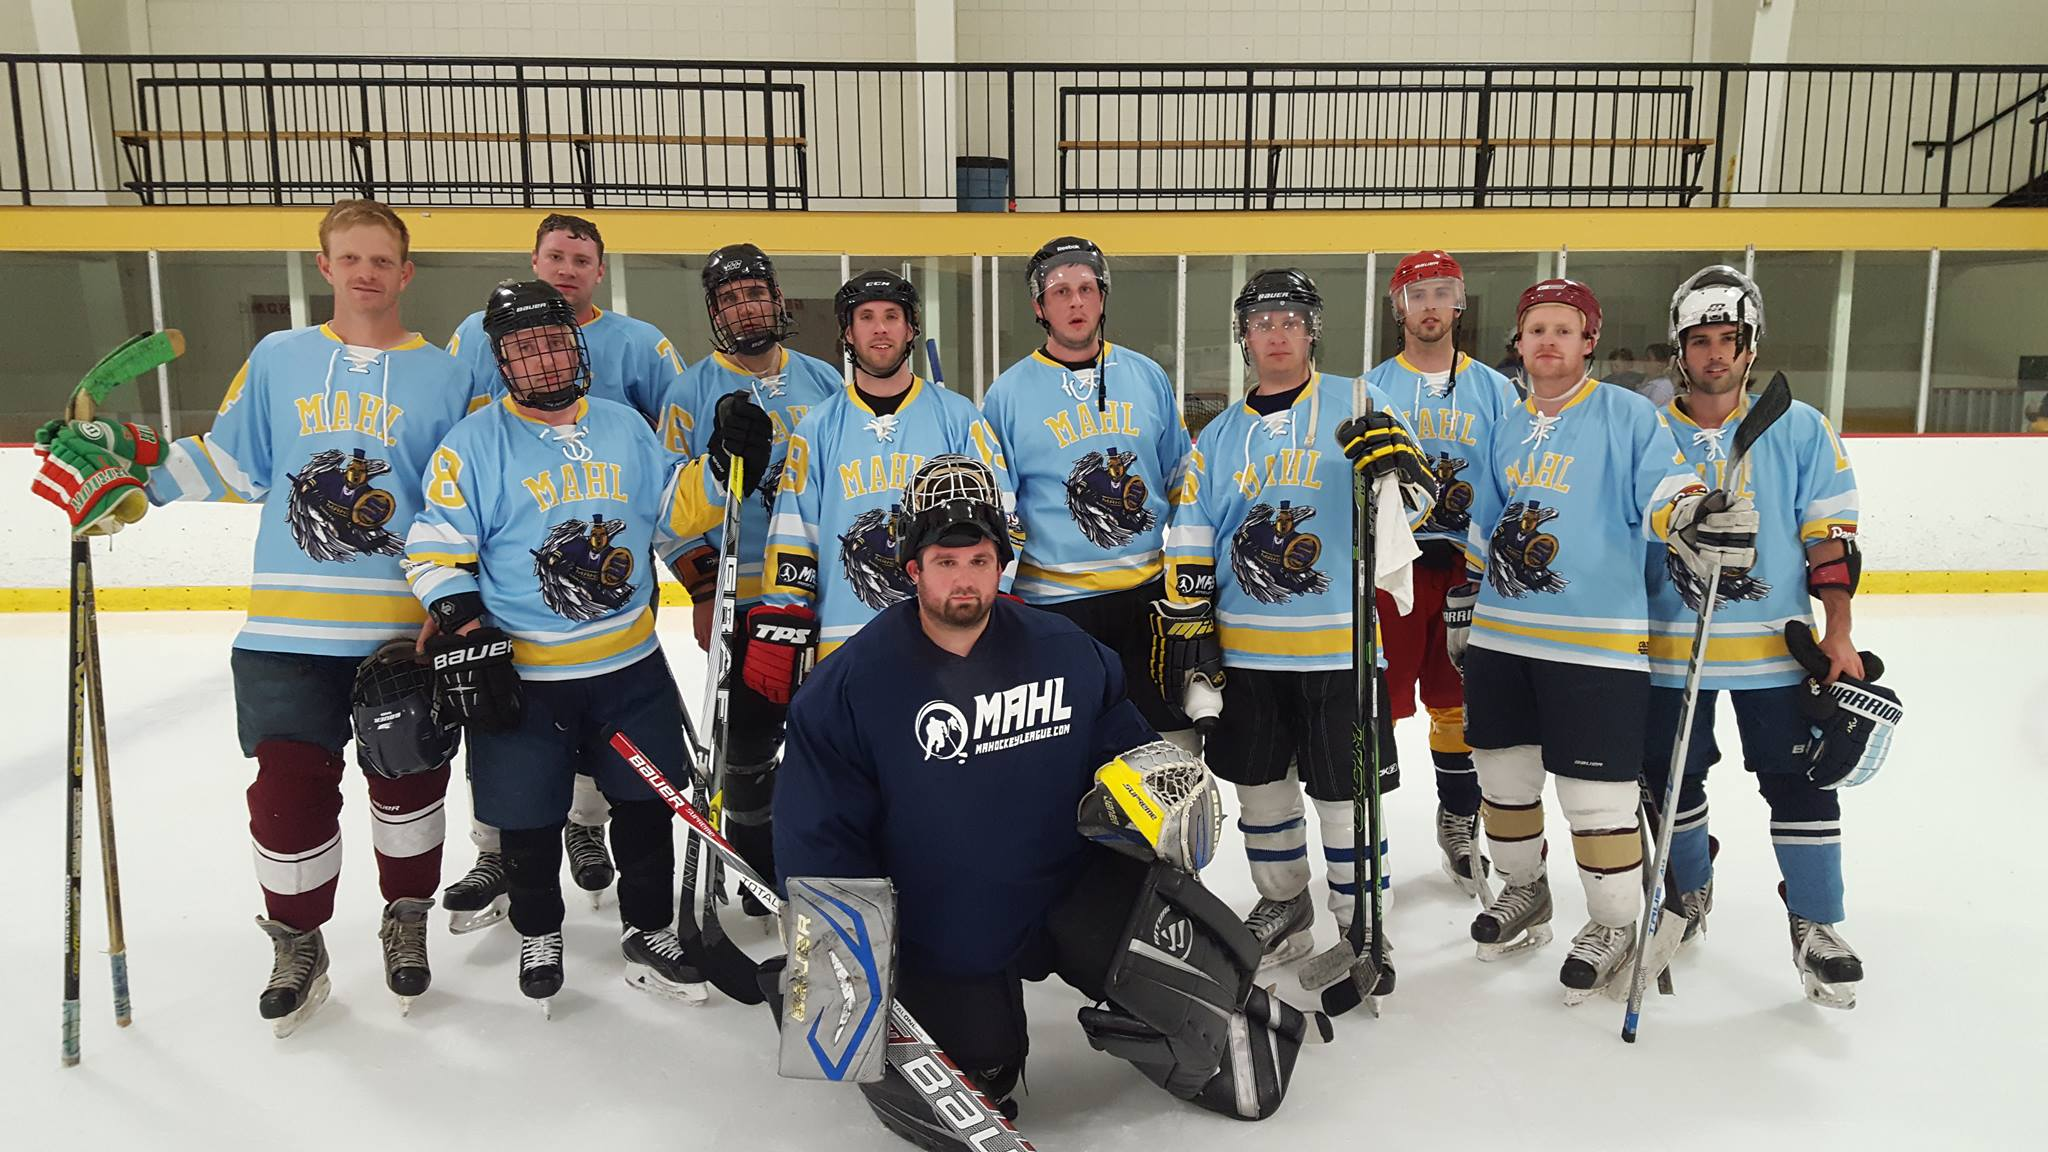 Mahl Saints Charity Team Ma Hockey League